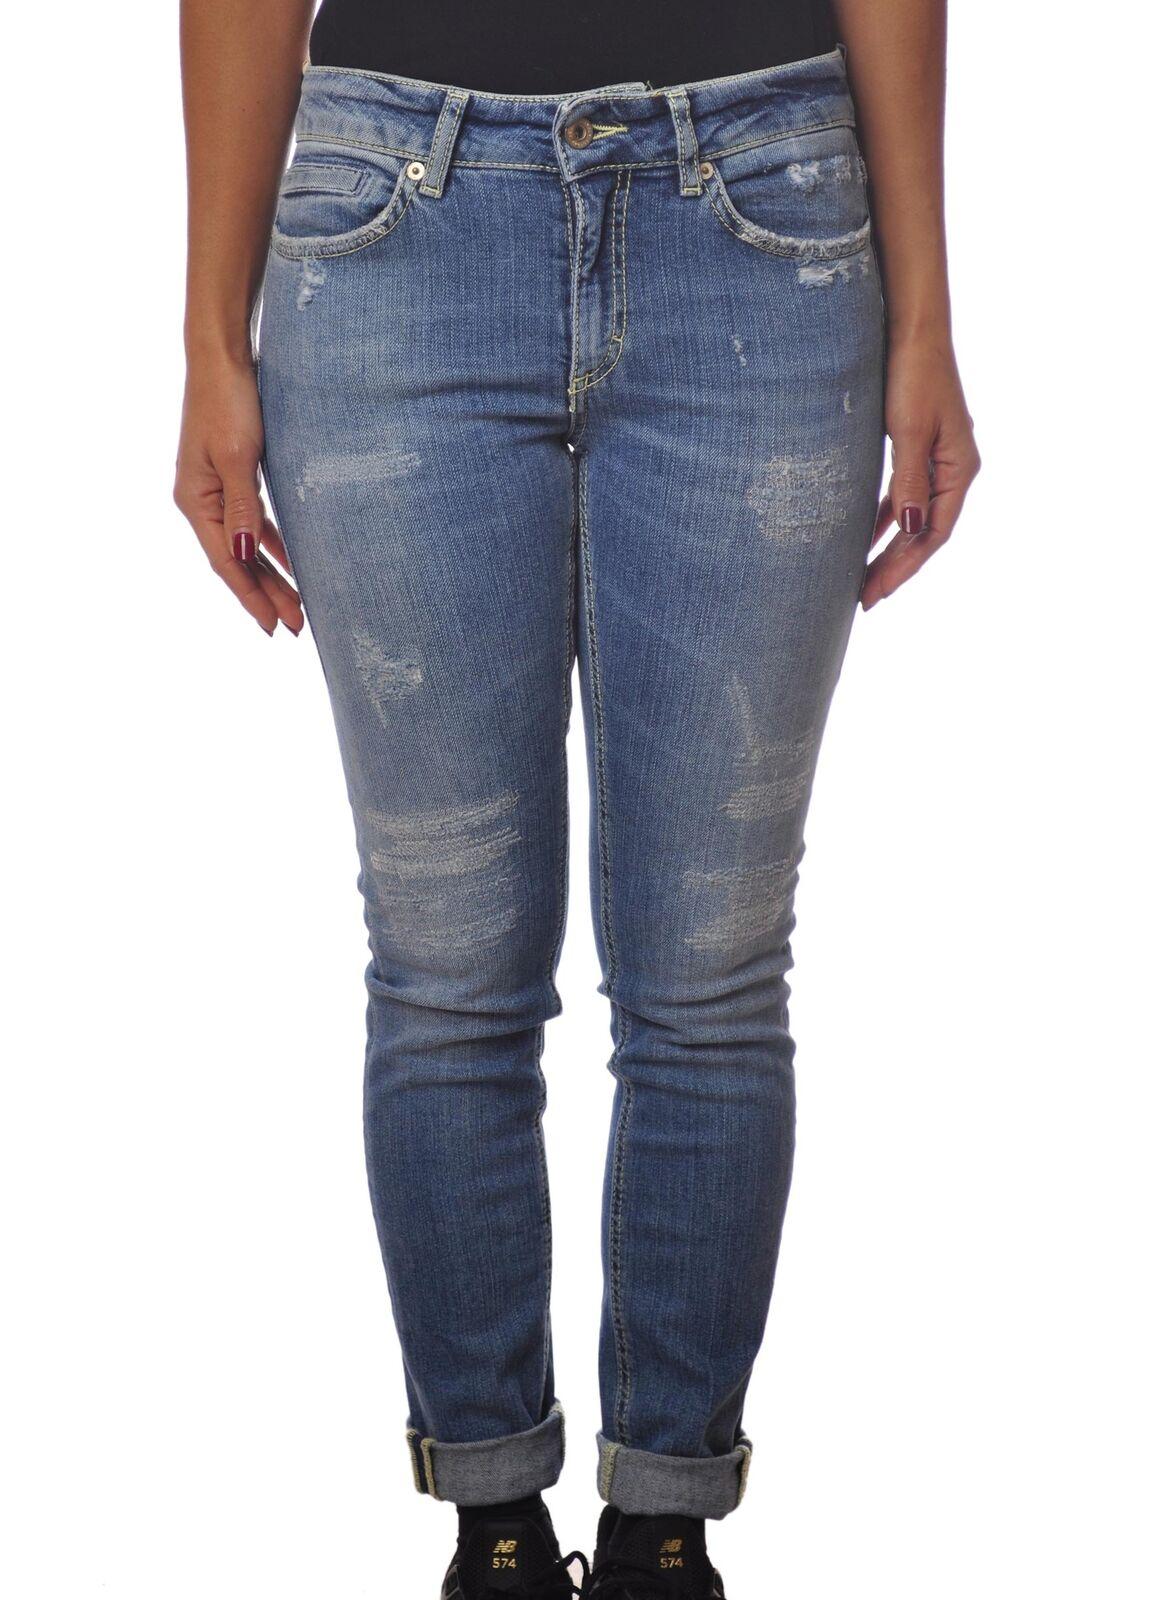 Dondup - Jeans-Pants-slim fit - Woman - Denim - 4495031G184218